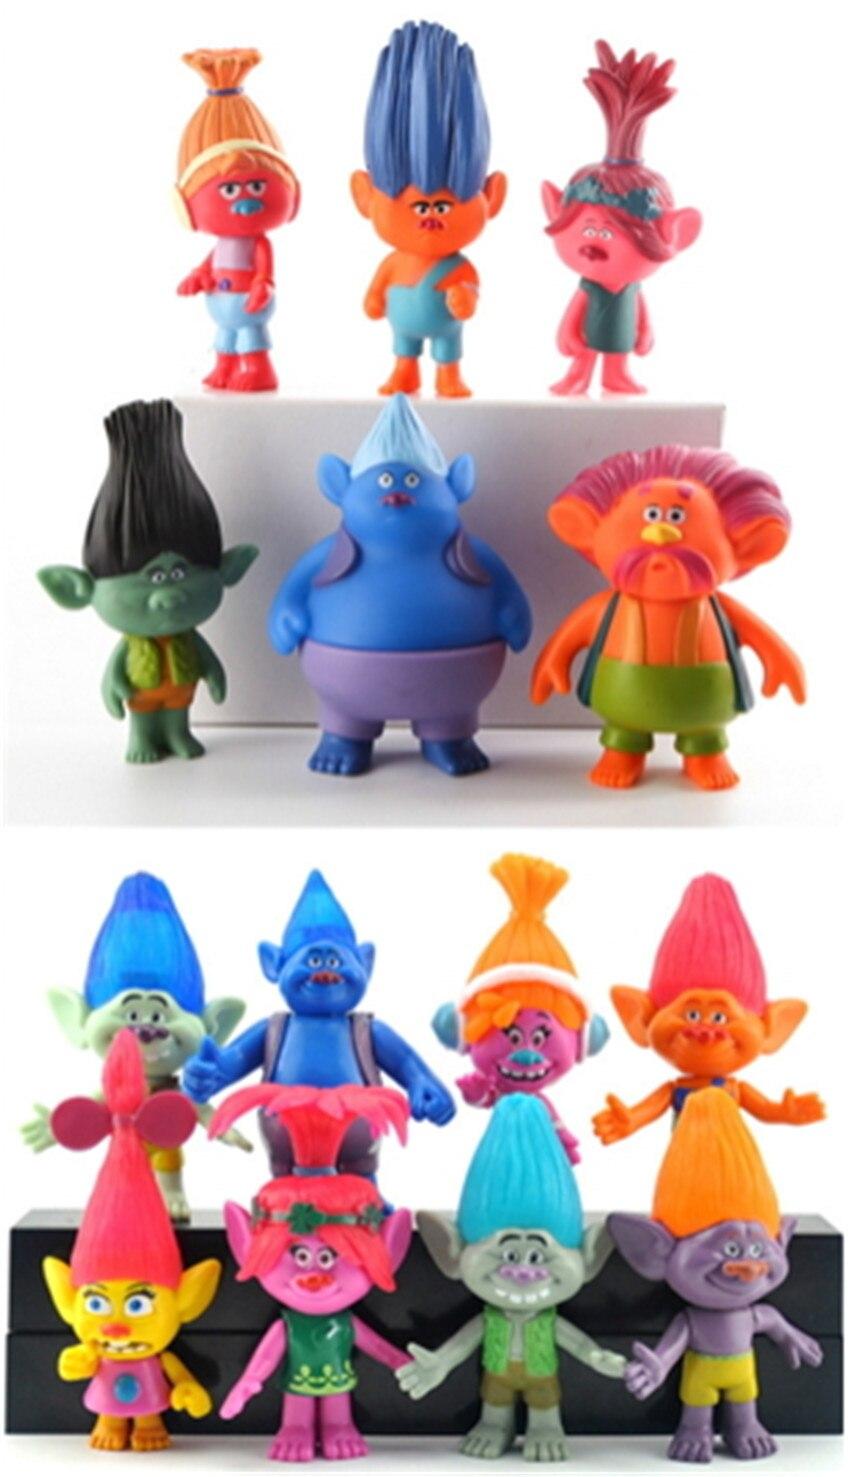 DreamWorks Cartoon Trolls Cosplay PVC Figure Kids Toy Collection<br><br>Aliexpress